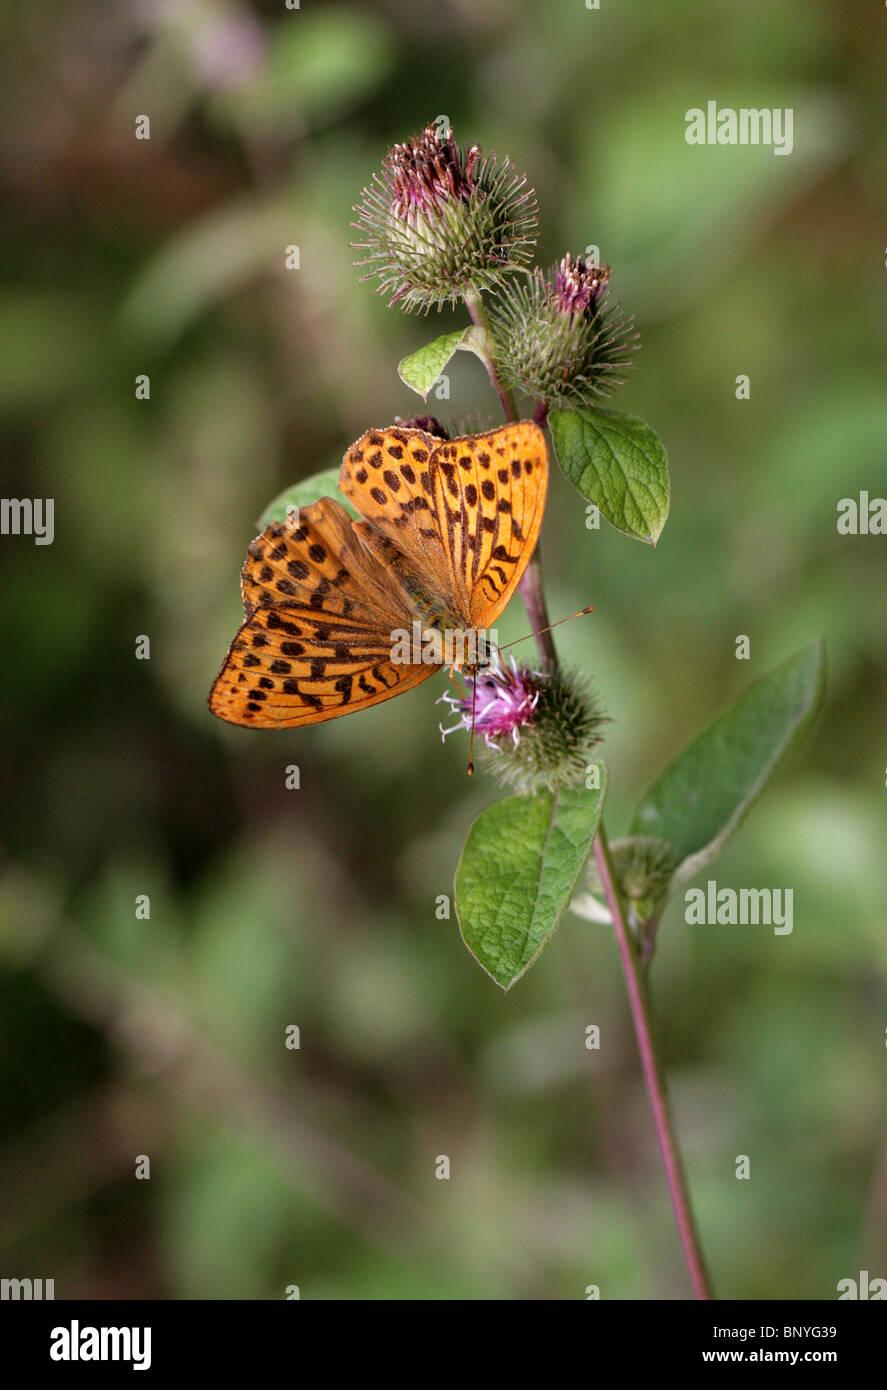 Silver-Washed Fritillary, Argynnis paphia, Nymphalidae. Feeding on Burdock Flower. Stock Photo